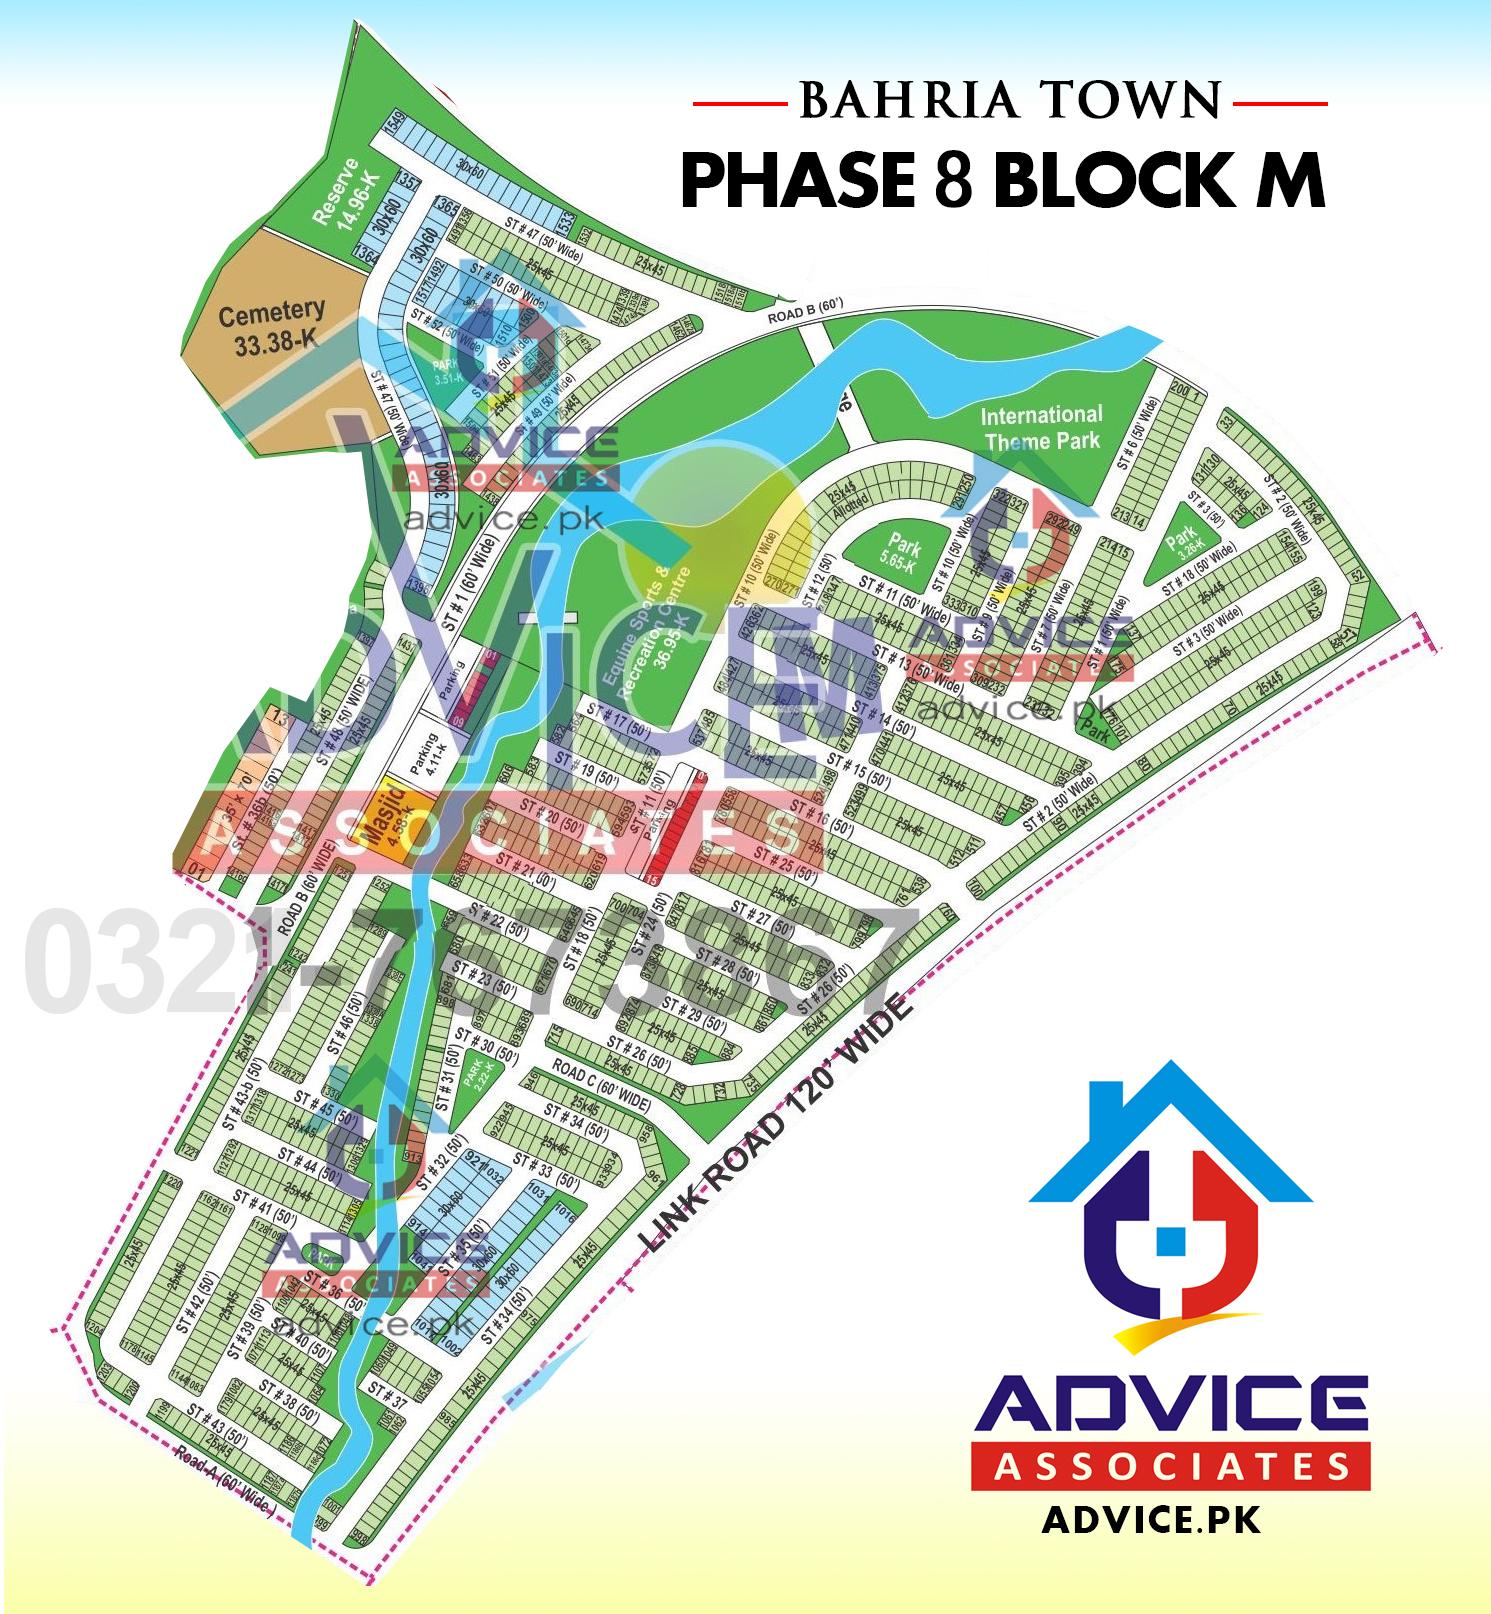 Bahria Town Phase 8 M Block